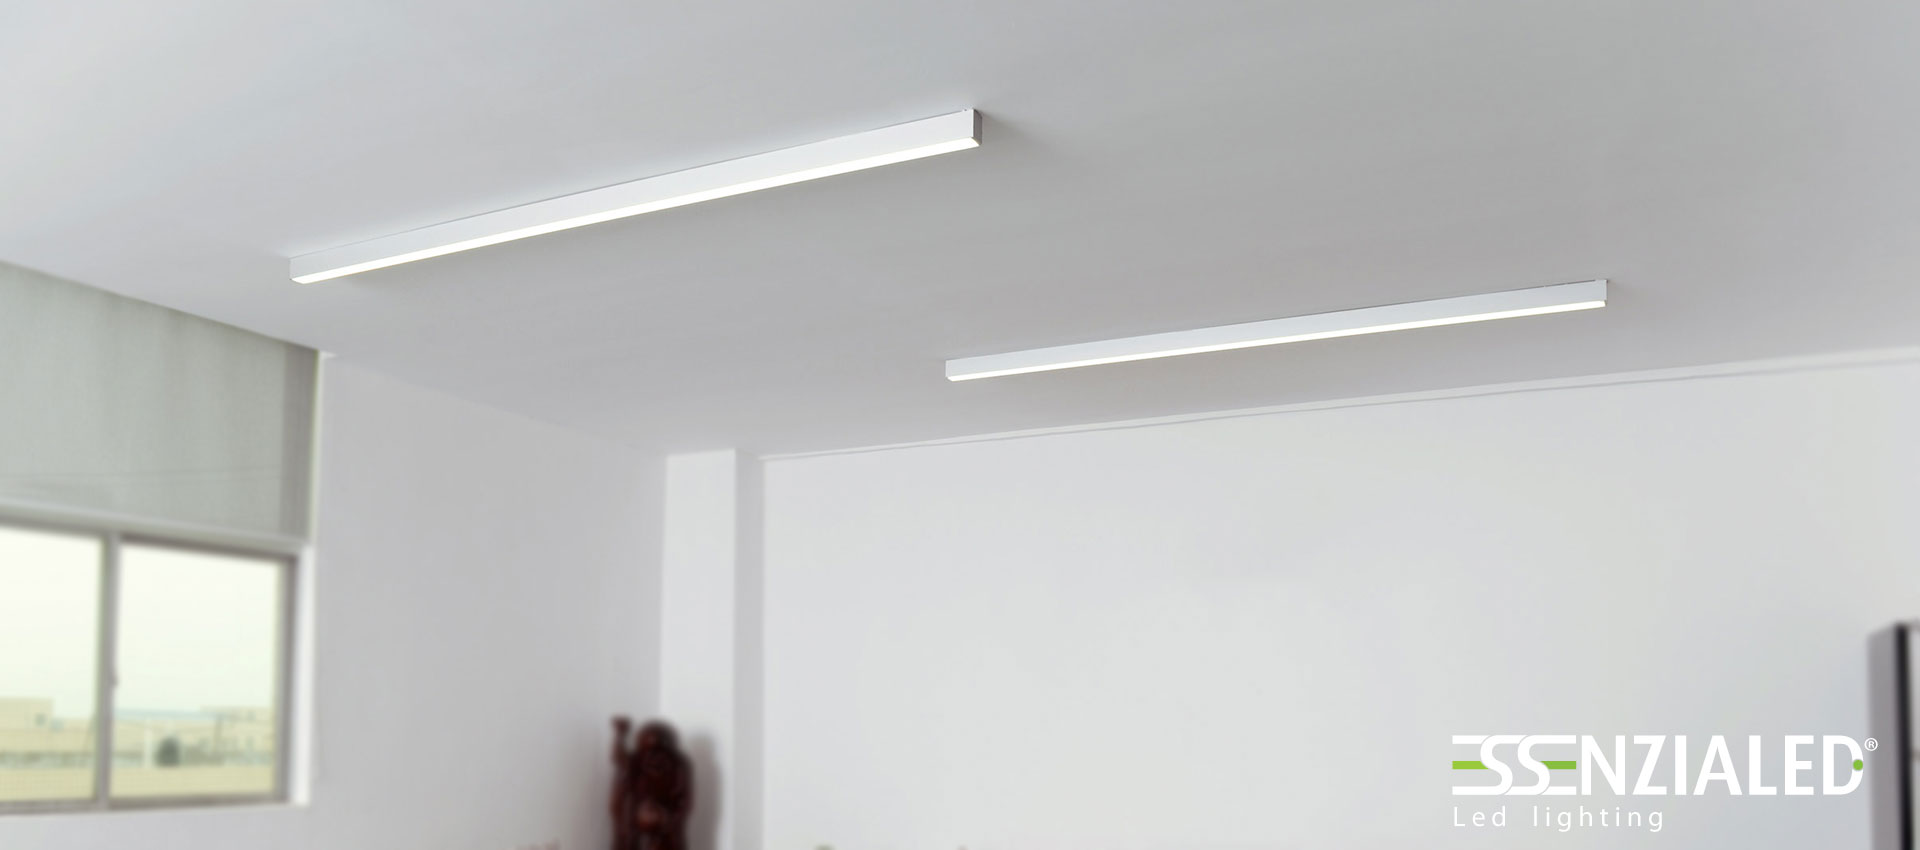 Illuminazione Led per uffici prodotte su misura MadeinItalyEssenzialed – Illu...